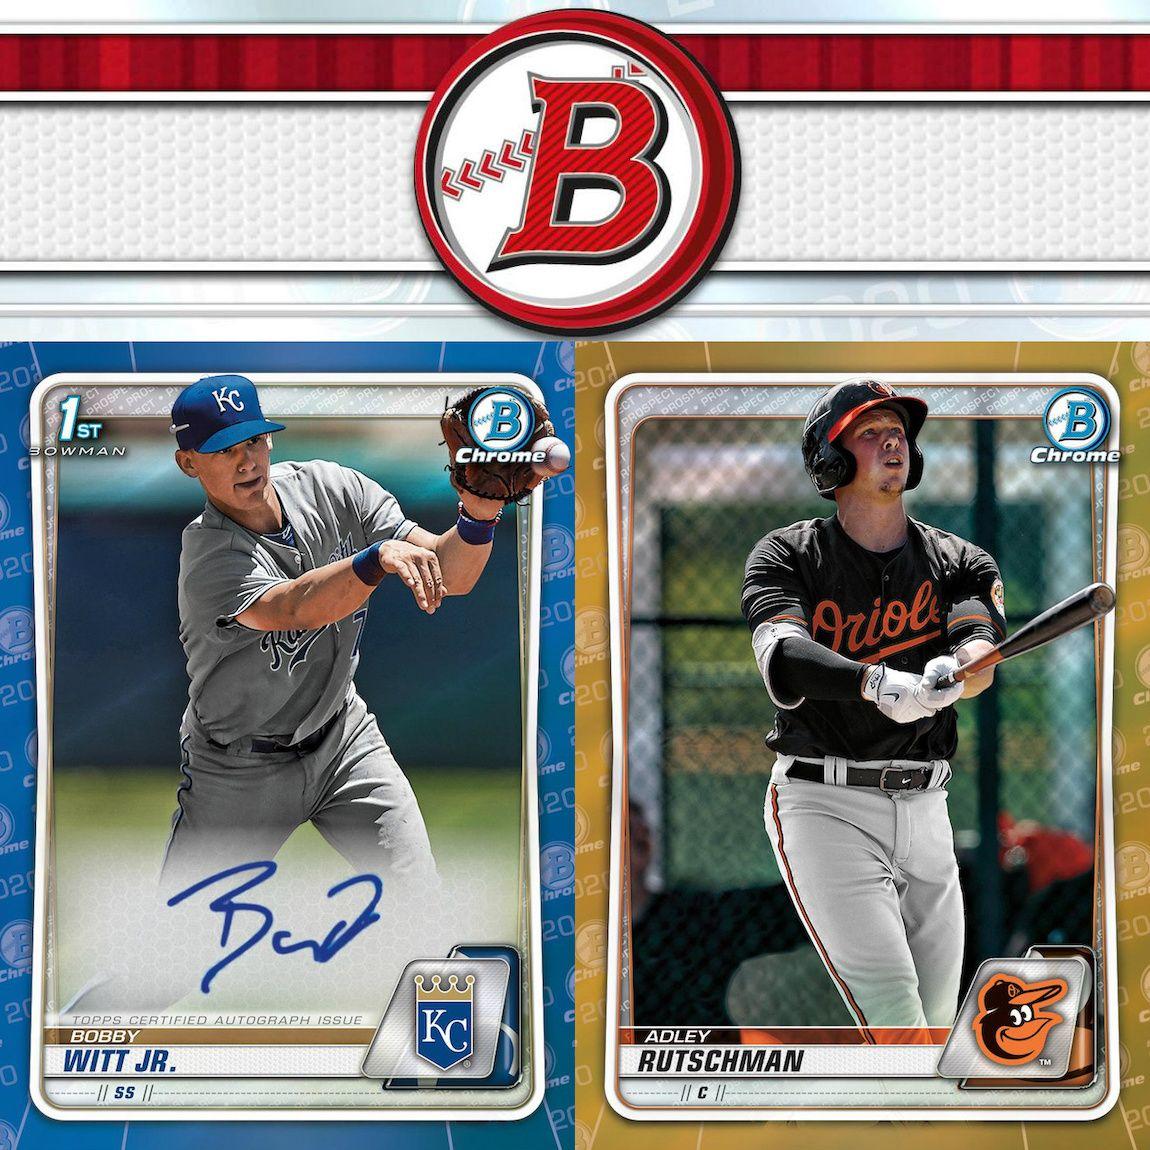 2020 Bowman Baseball Cards Set Details Bowman Baseball Cards Baseball Cards Baseball